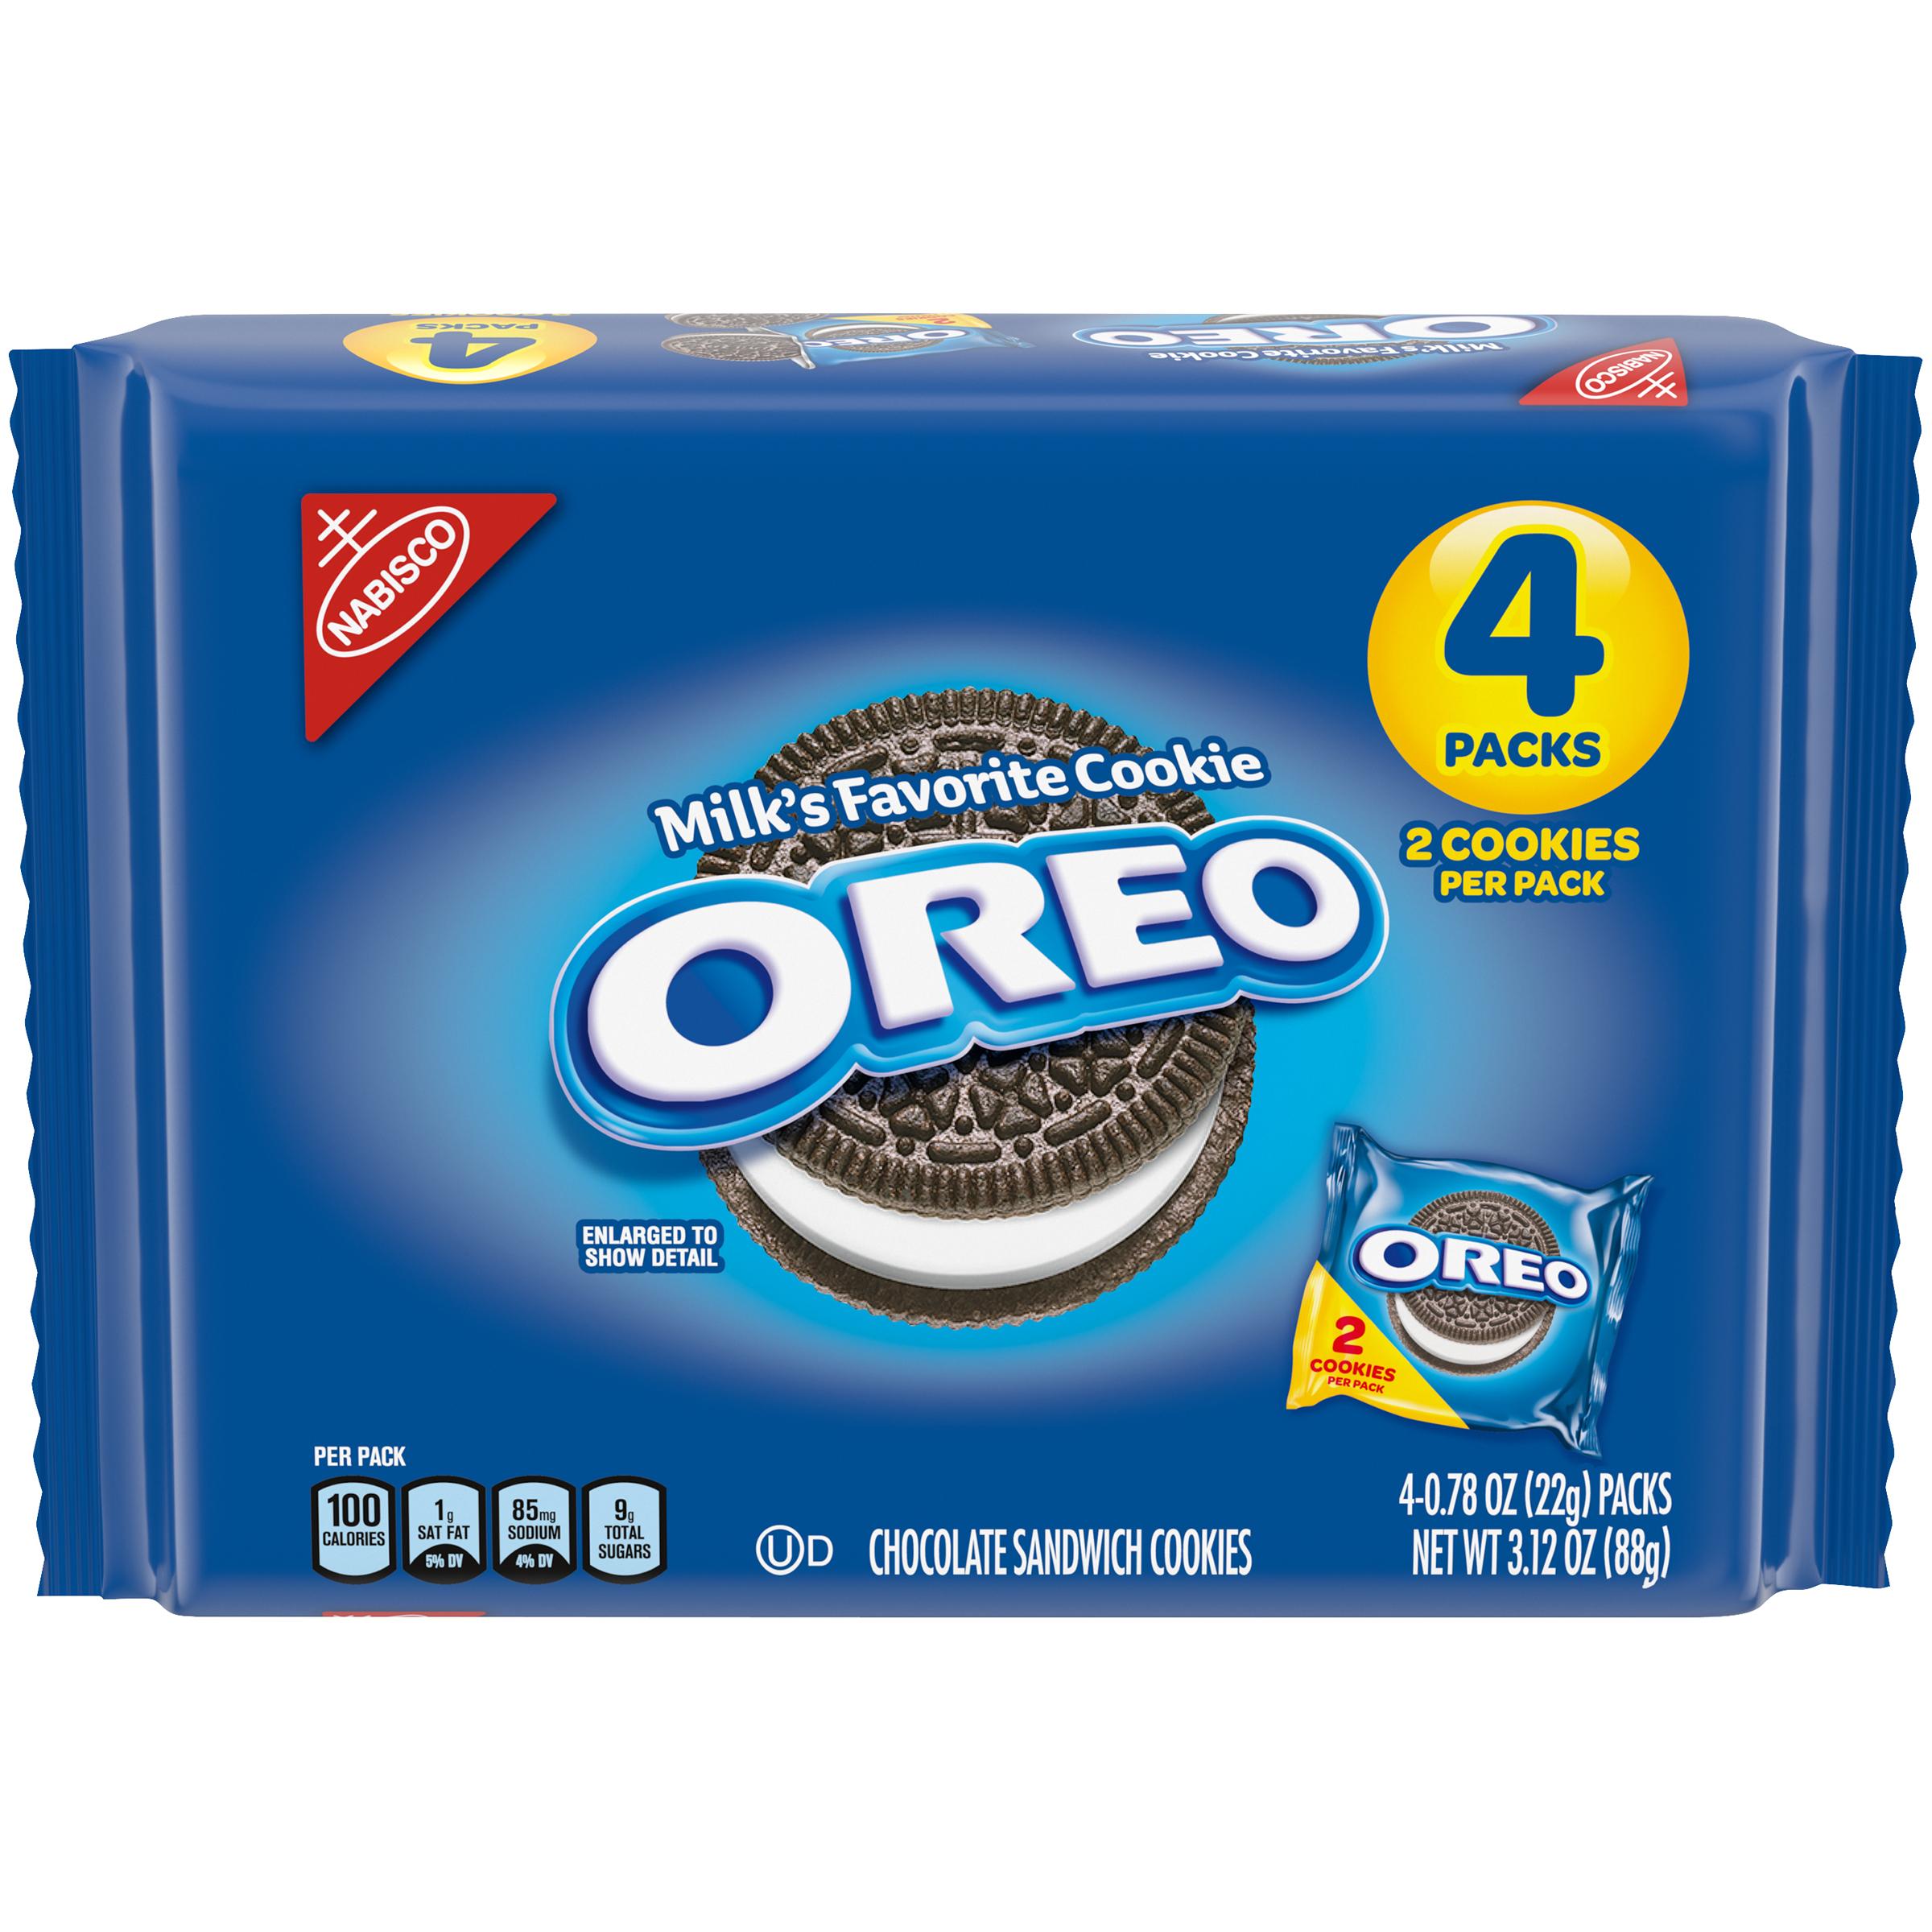 OREO Cookies 3.12 oz